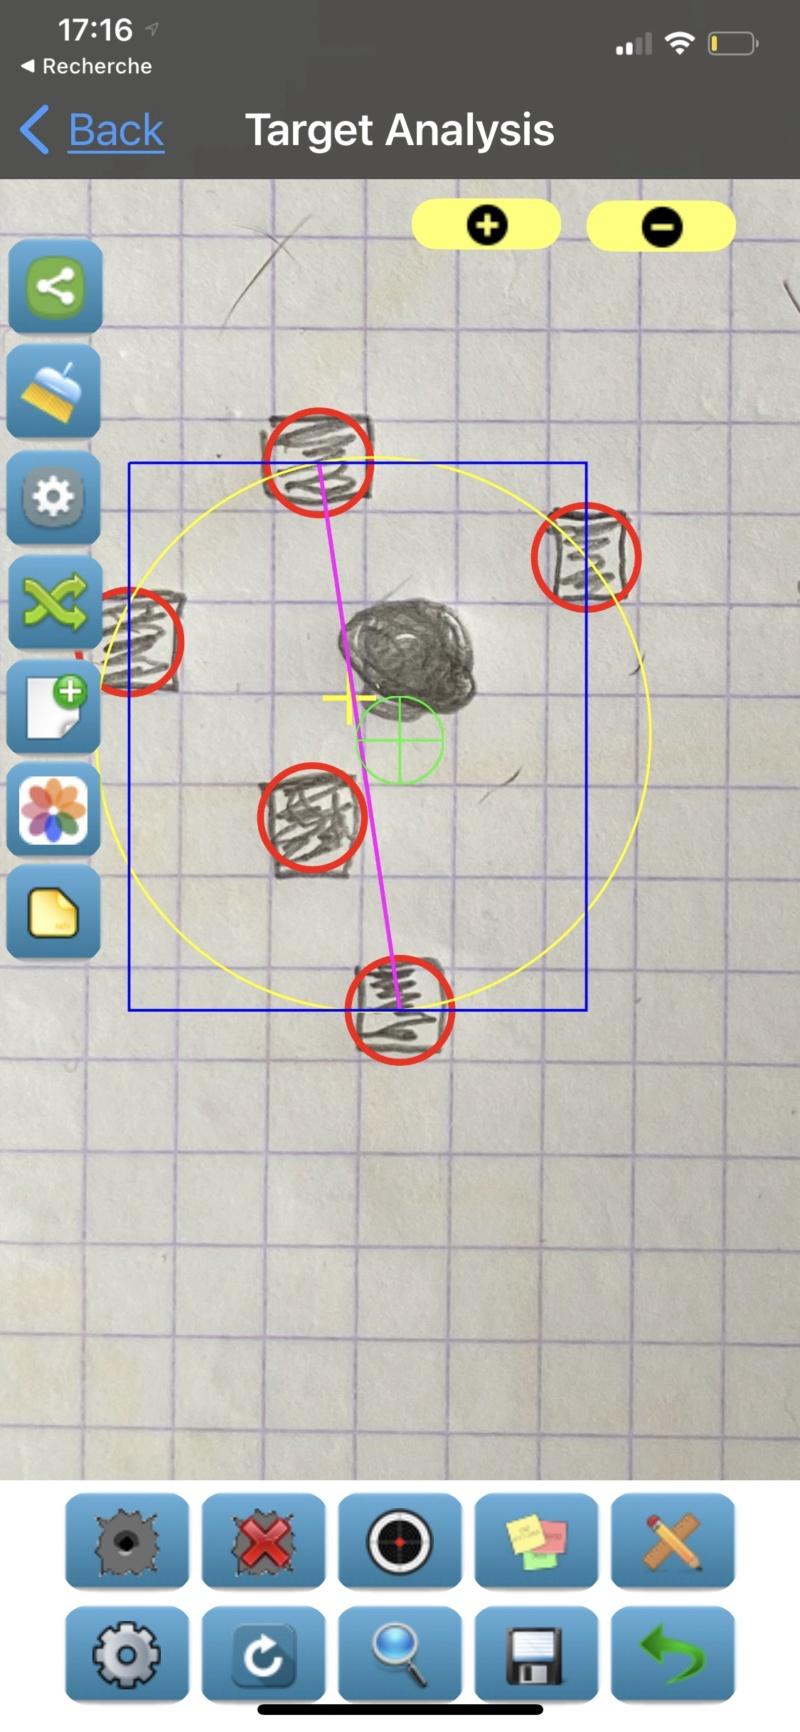 Groupe size mode de calcul Submoa, ballistic-x, targetScan  ?  22120110